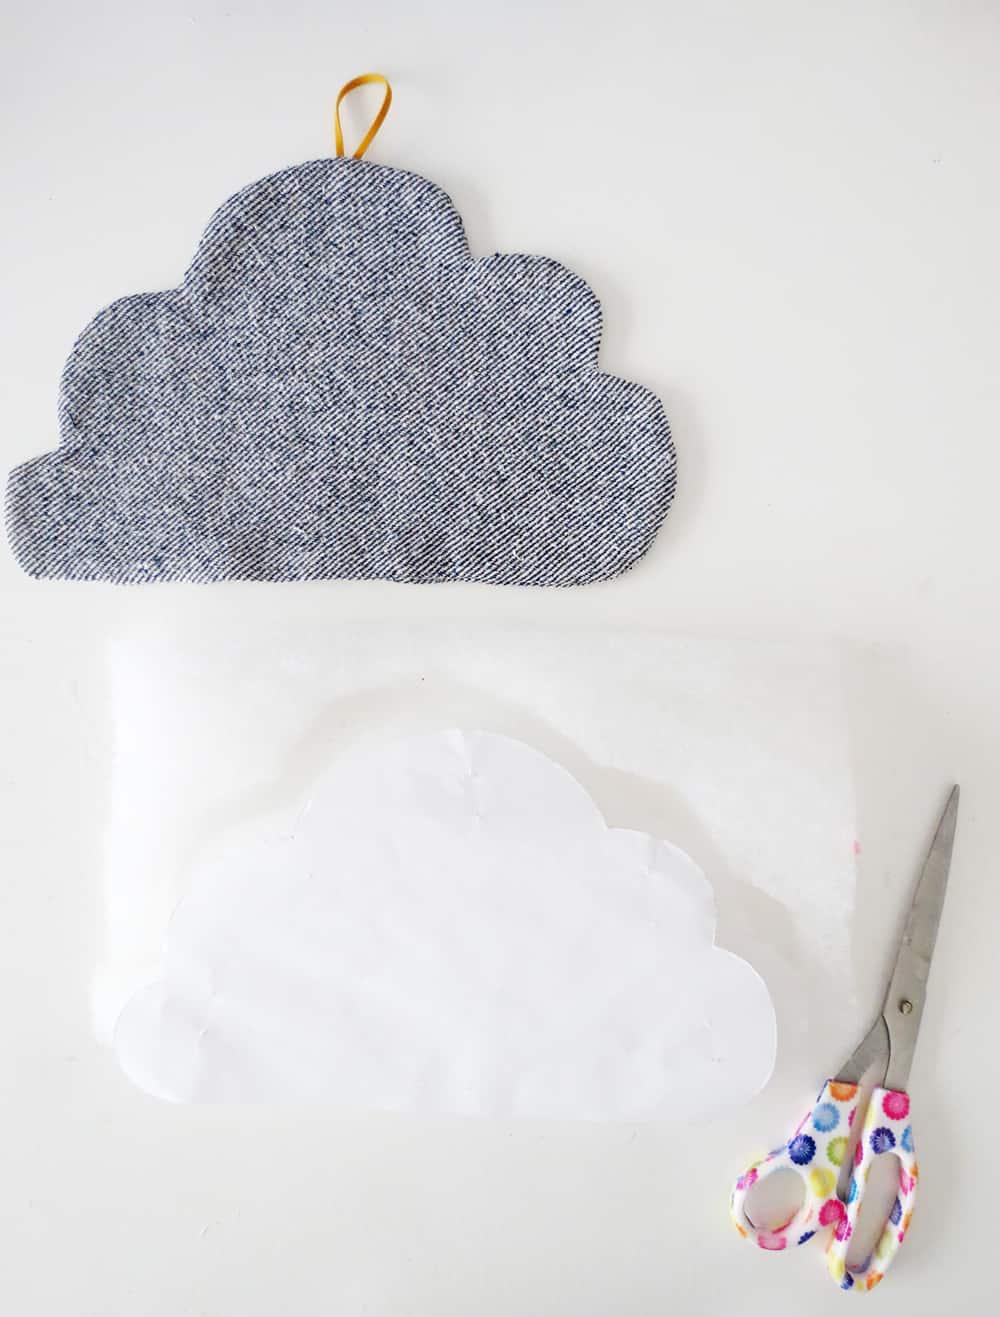 sew cloud pot holder free pattern